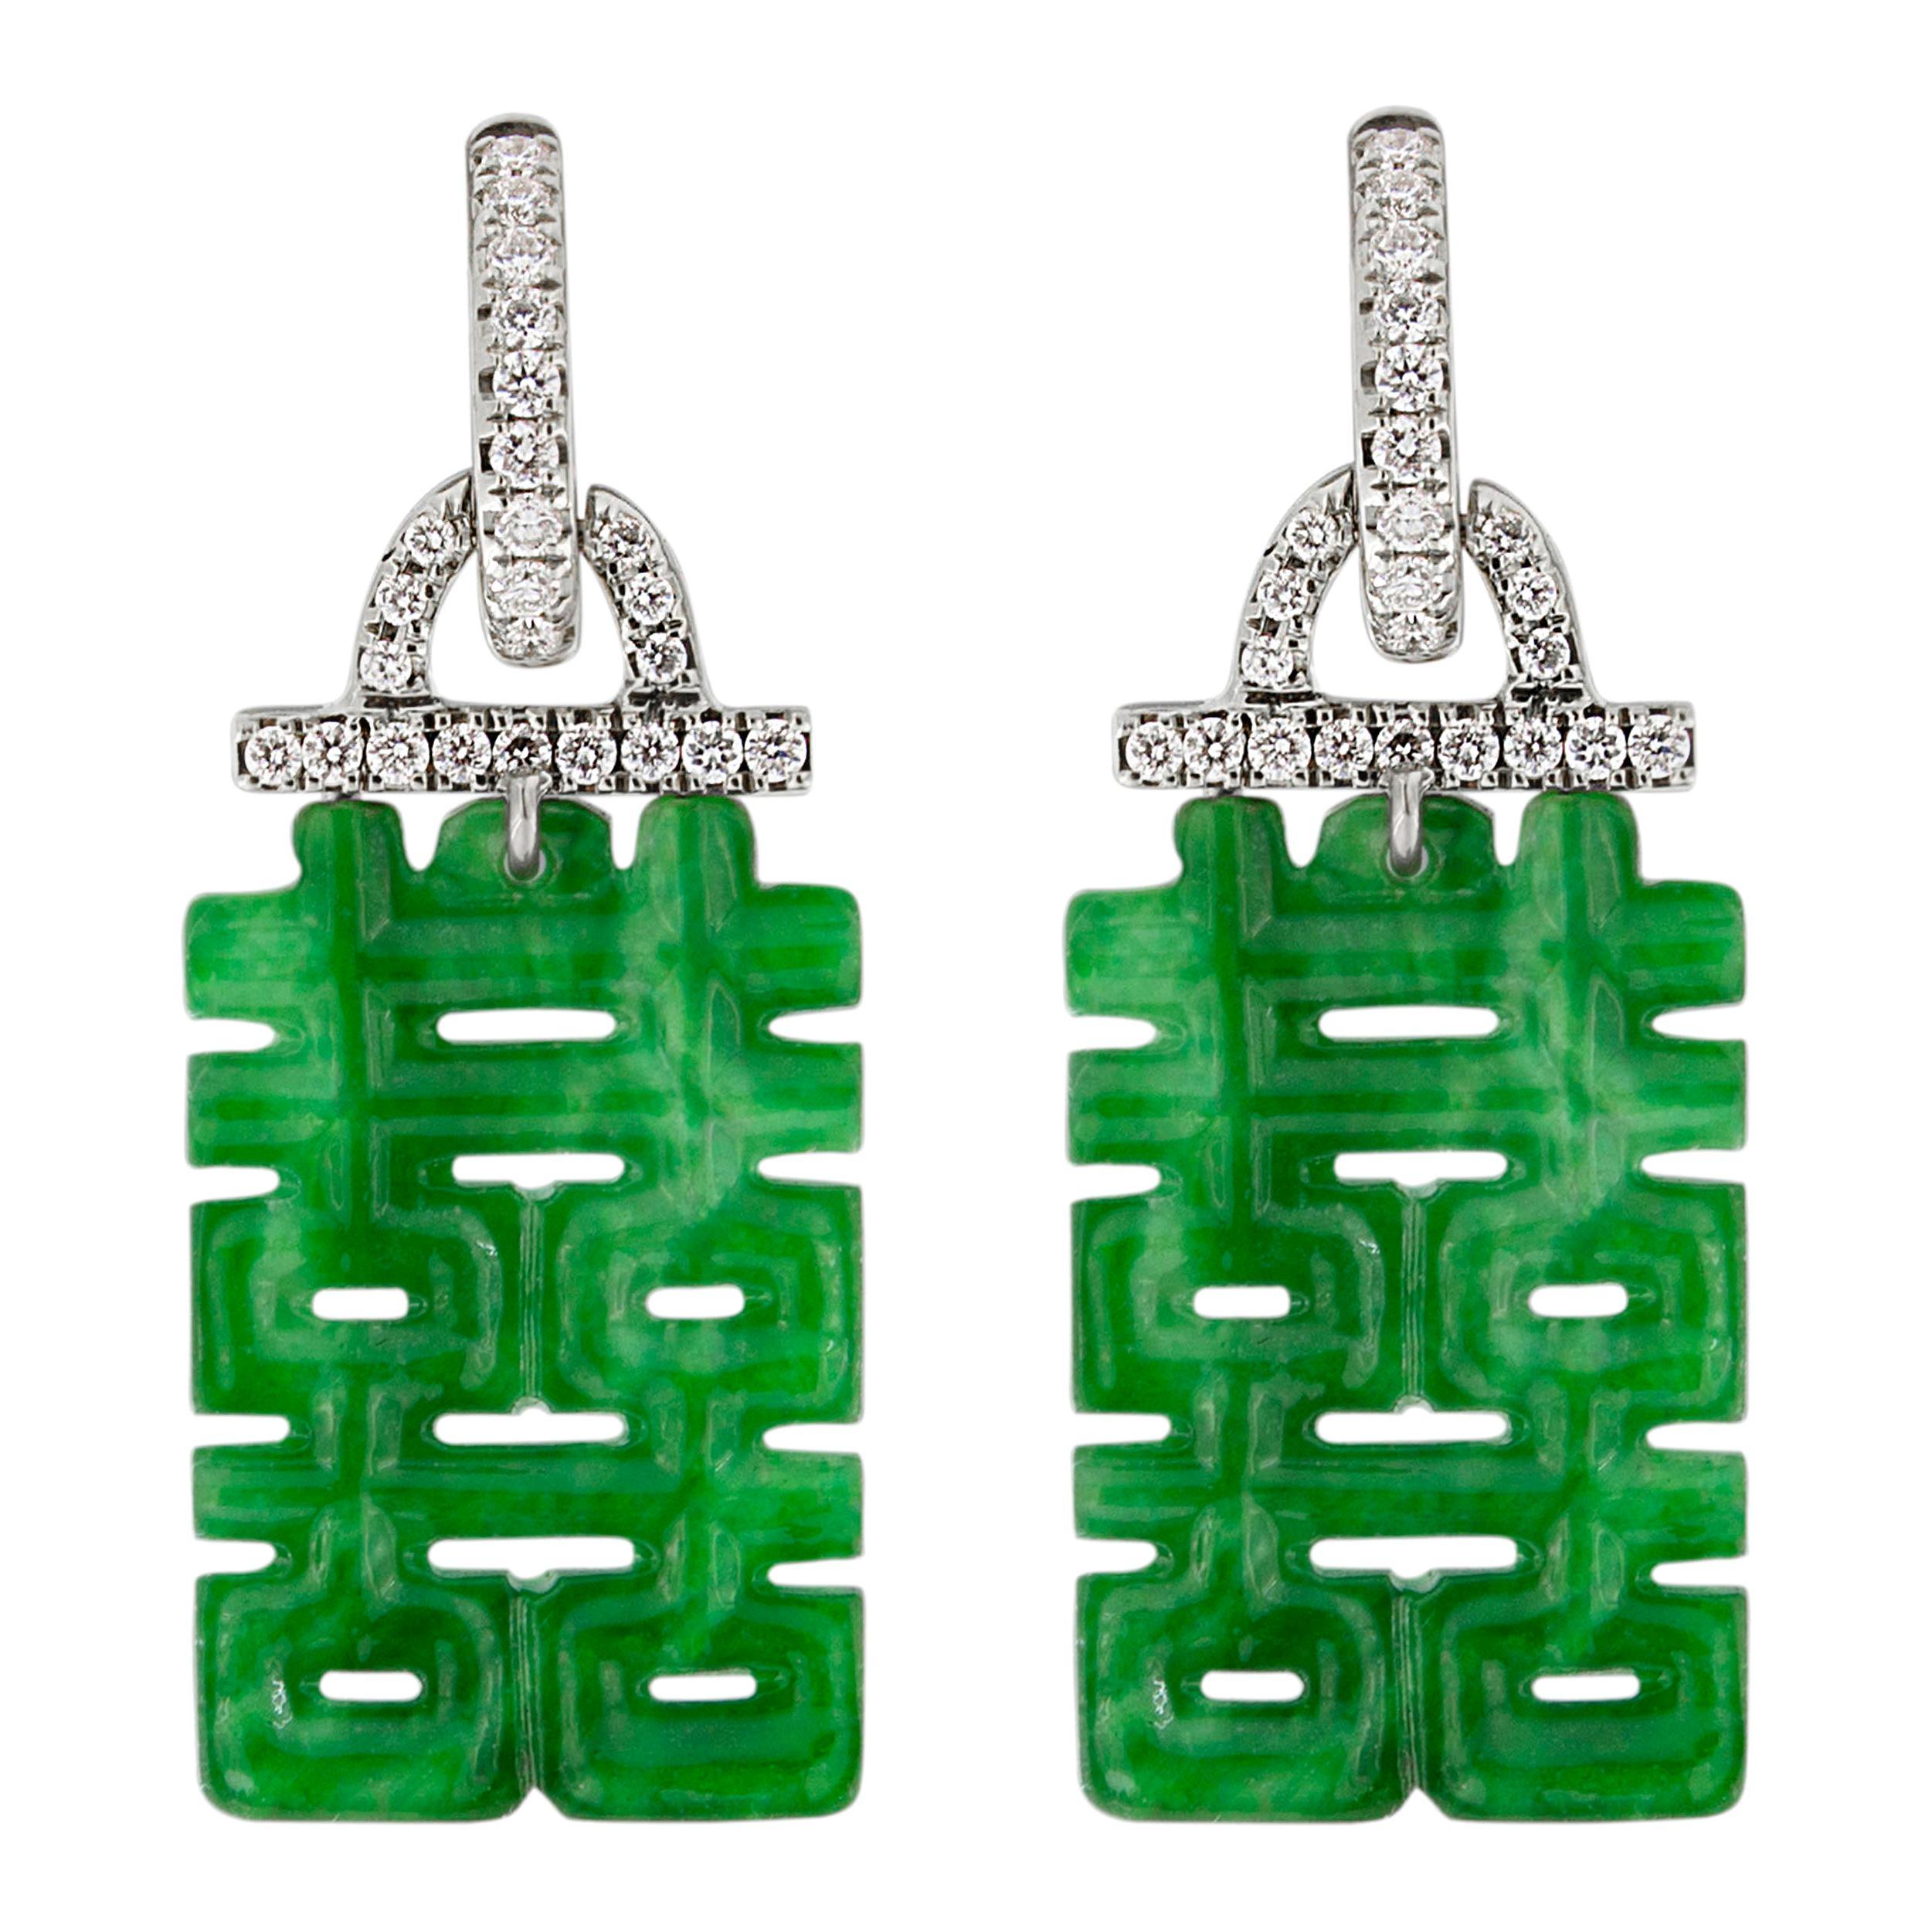 Jona Burmese Jadeite Jade White Diamond 18 Karat White Gold Pendant Earrings